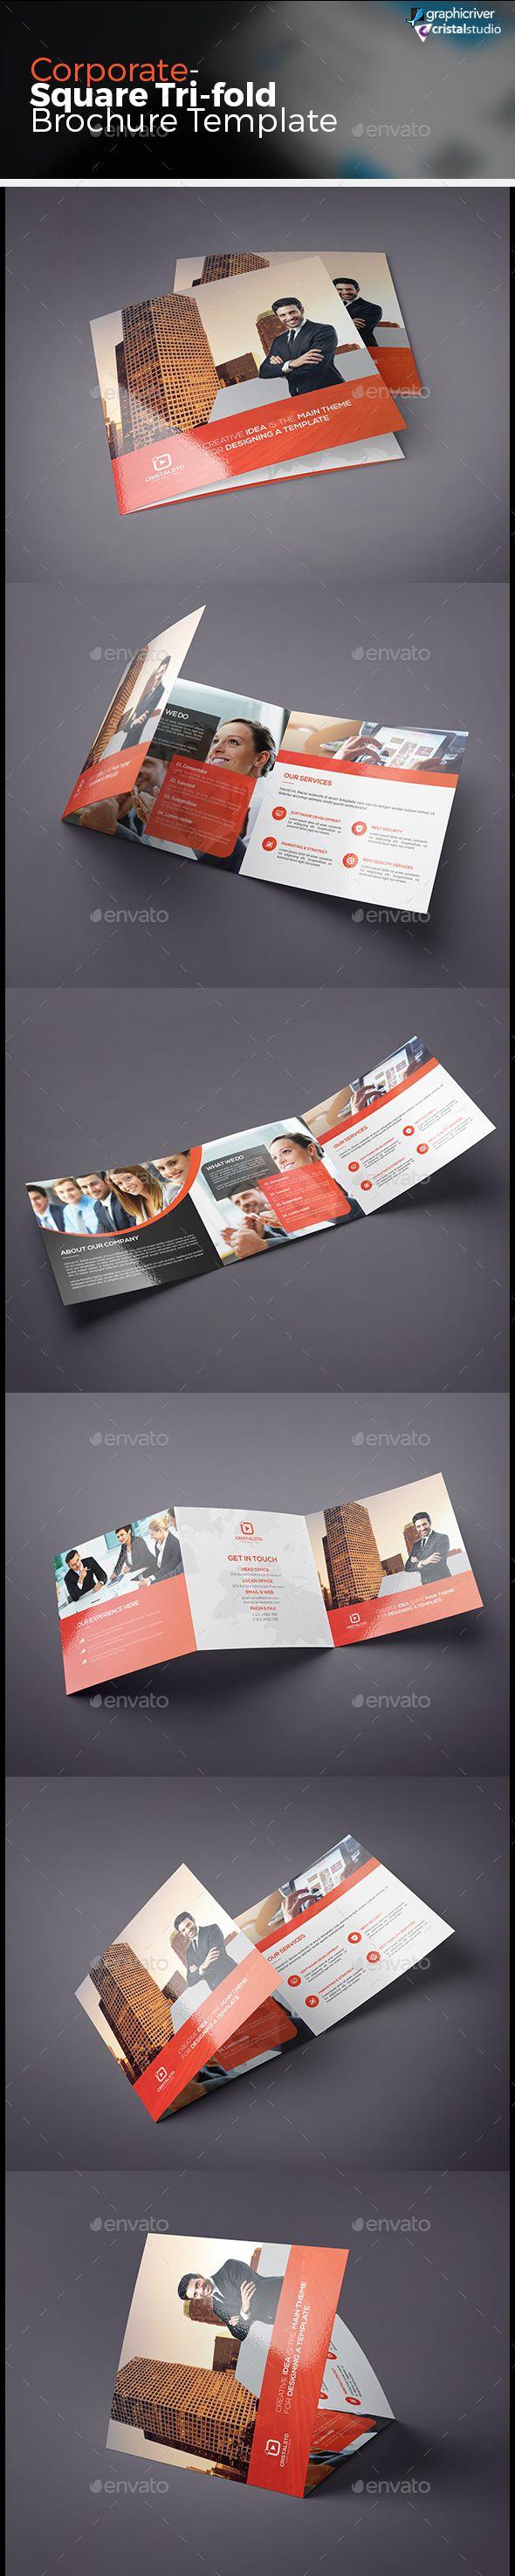 Square Tri-fold Brochure Vector Template EPS, AI #design Download: http://graphicriver.net/item/square-trifold-brochure/13554072?ref=ksioks